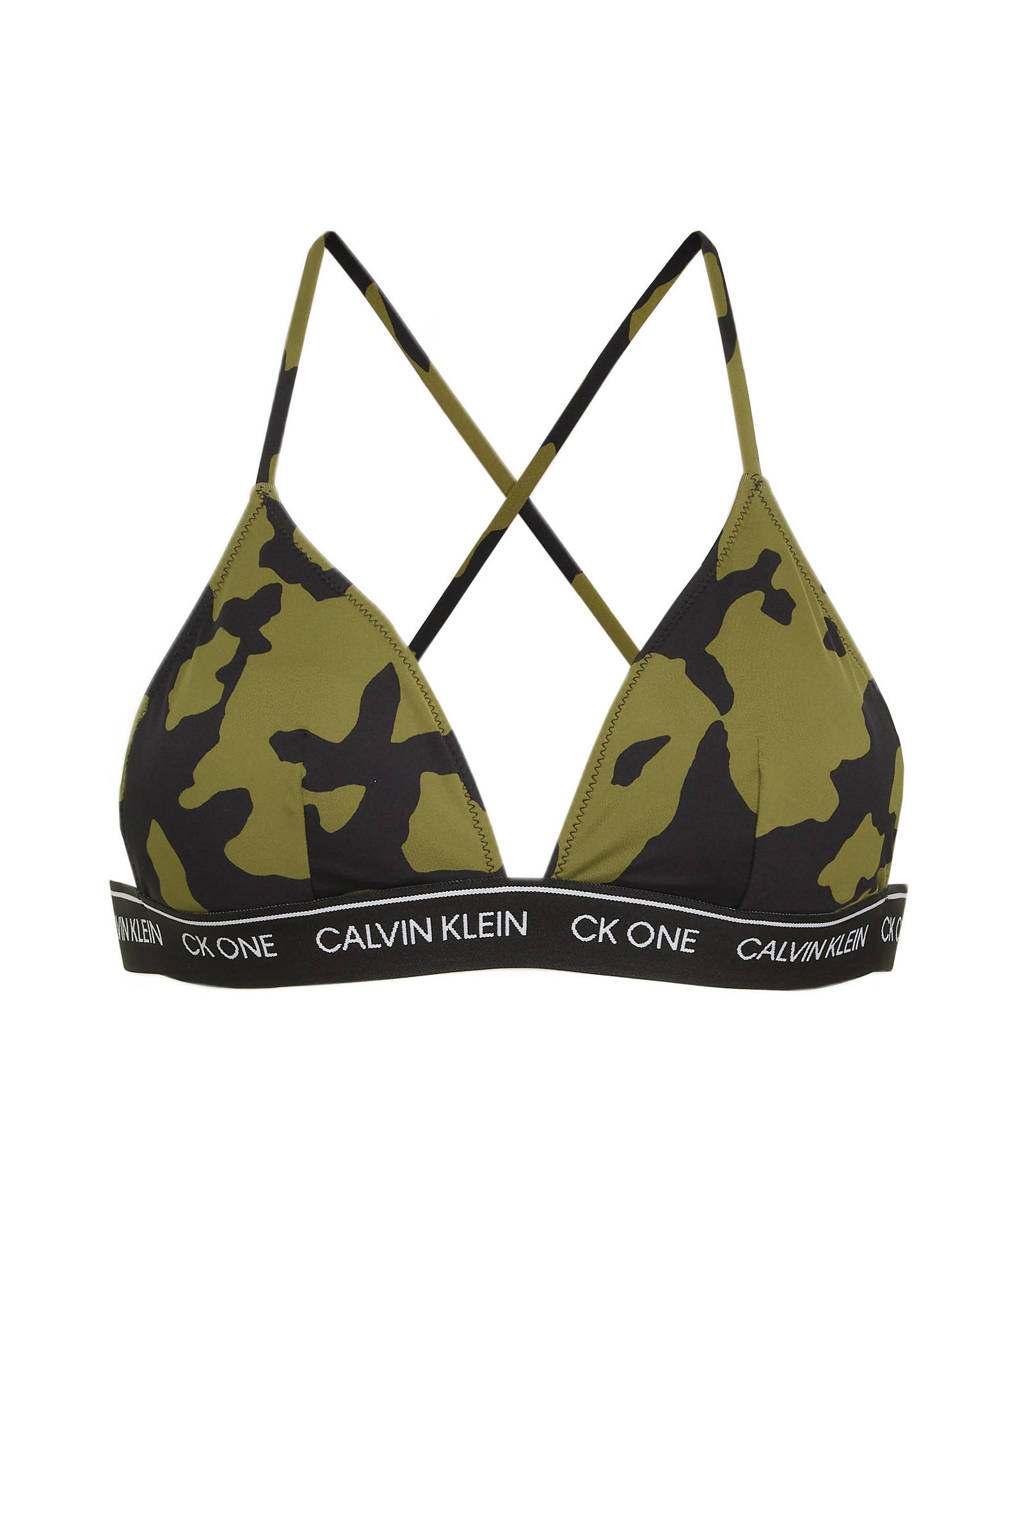 CALVIN KLEIN triangel bikinitop met camouflageprint donkergroen/zwart, Donkergroen/zwart